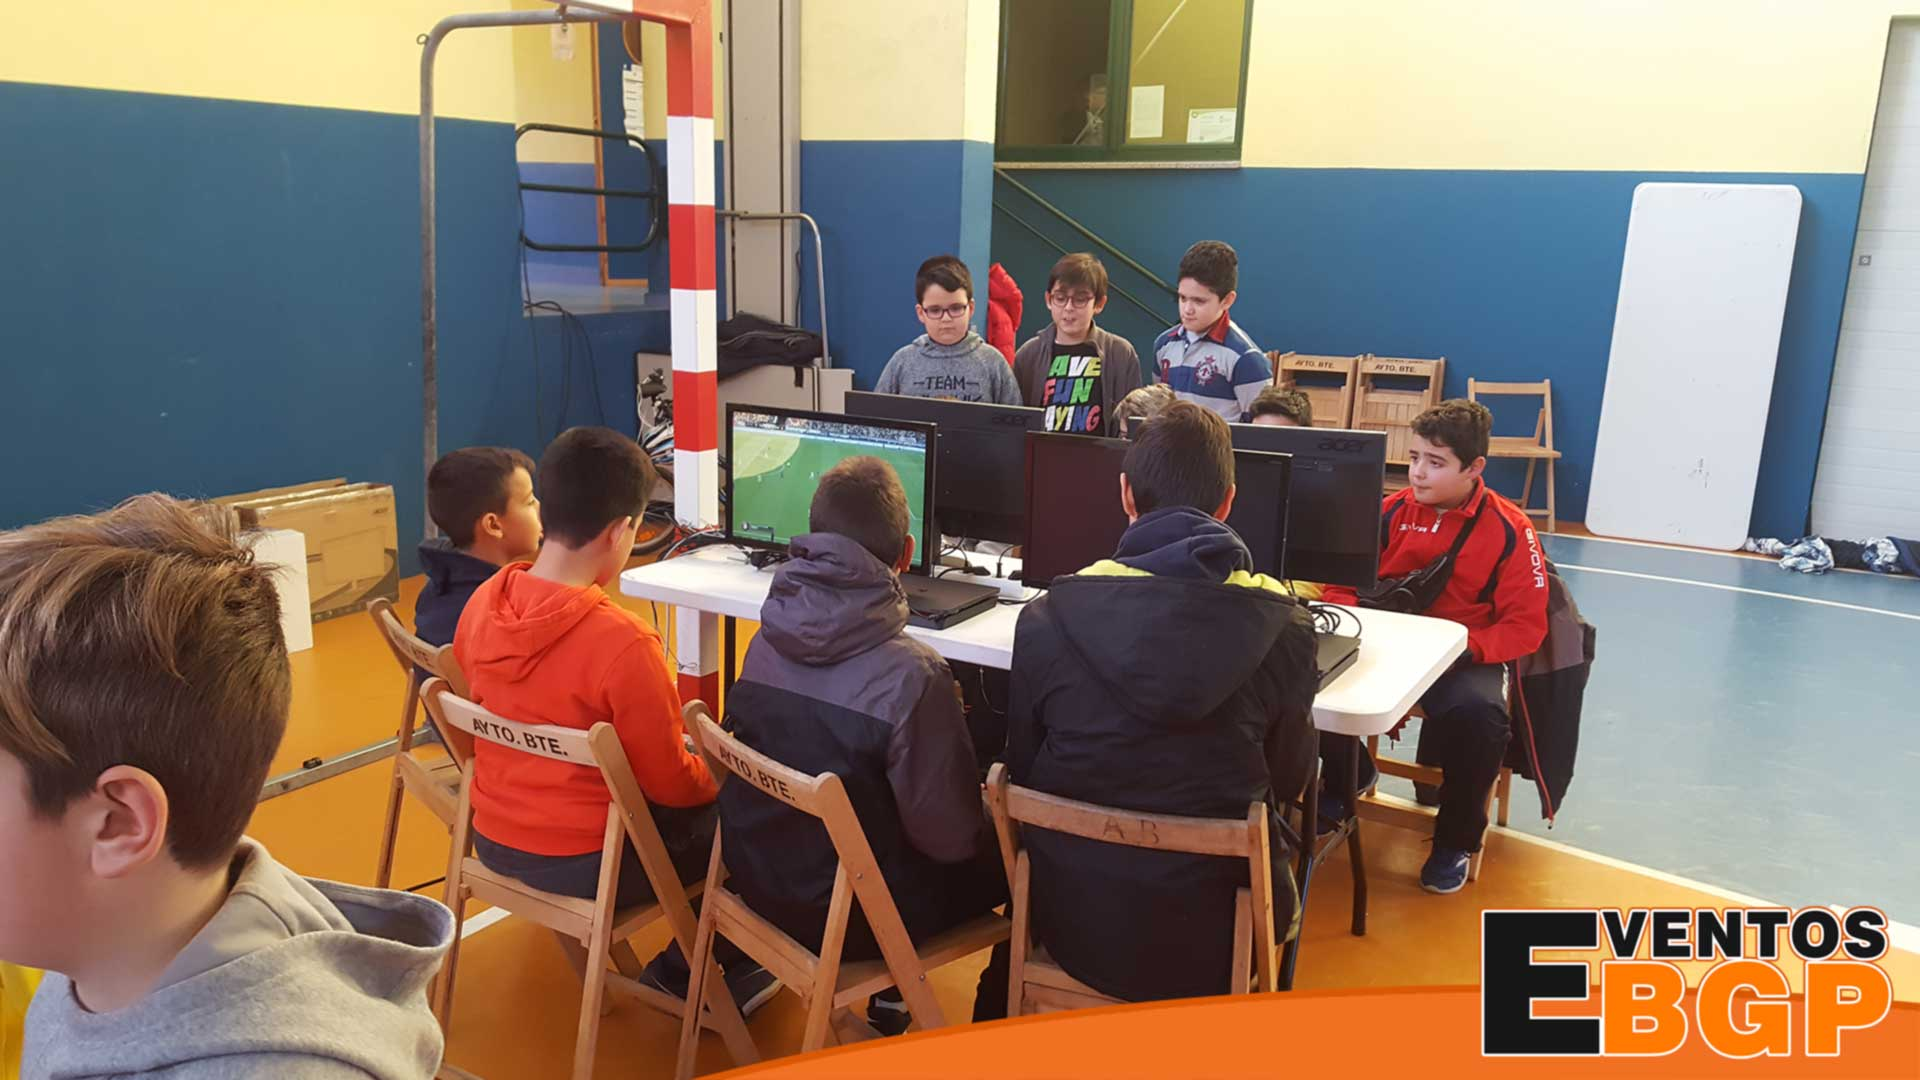 Benavente evento con videojuegos actividades para jóvenes con Eventos BGP.